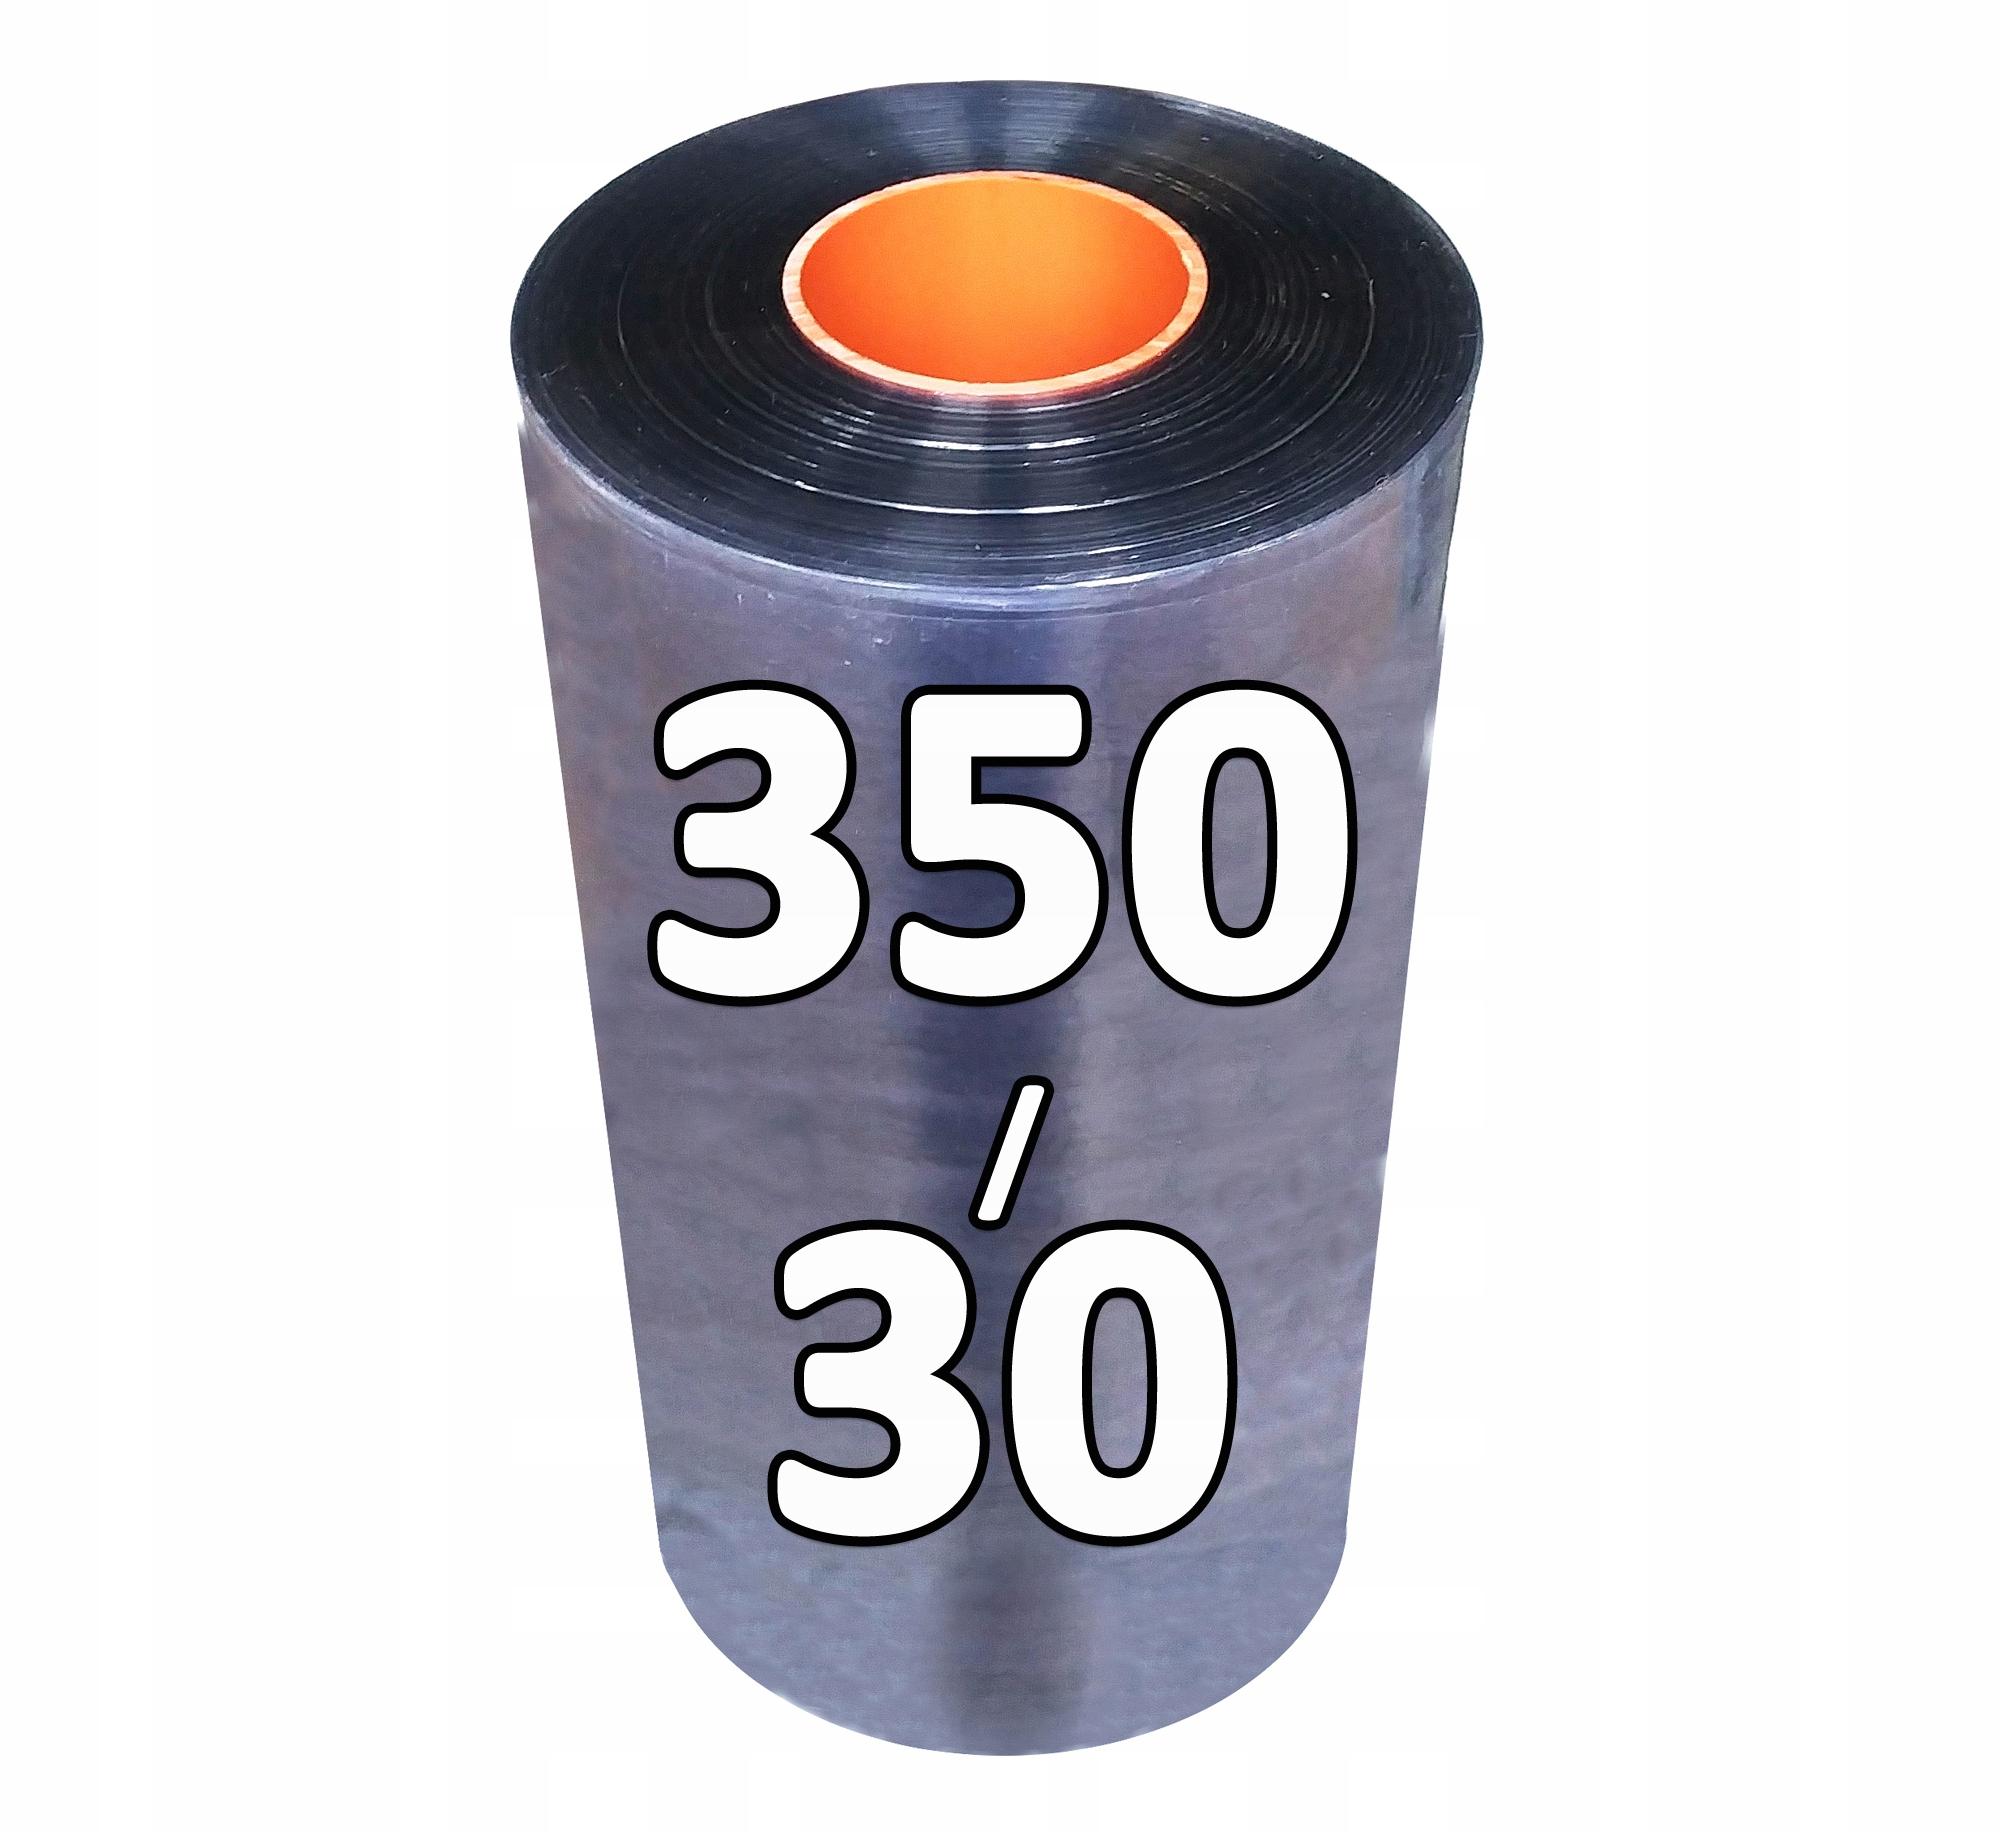 ТЕРМОУСАДОЧНАЯ ПЛЕНКА ПВХ 350/30 толстая крепкая свежая